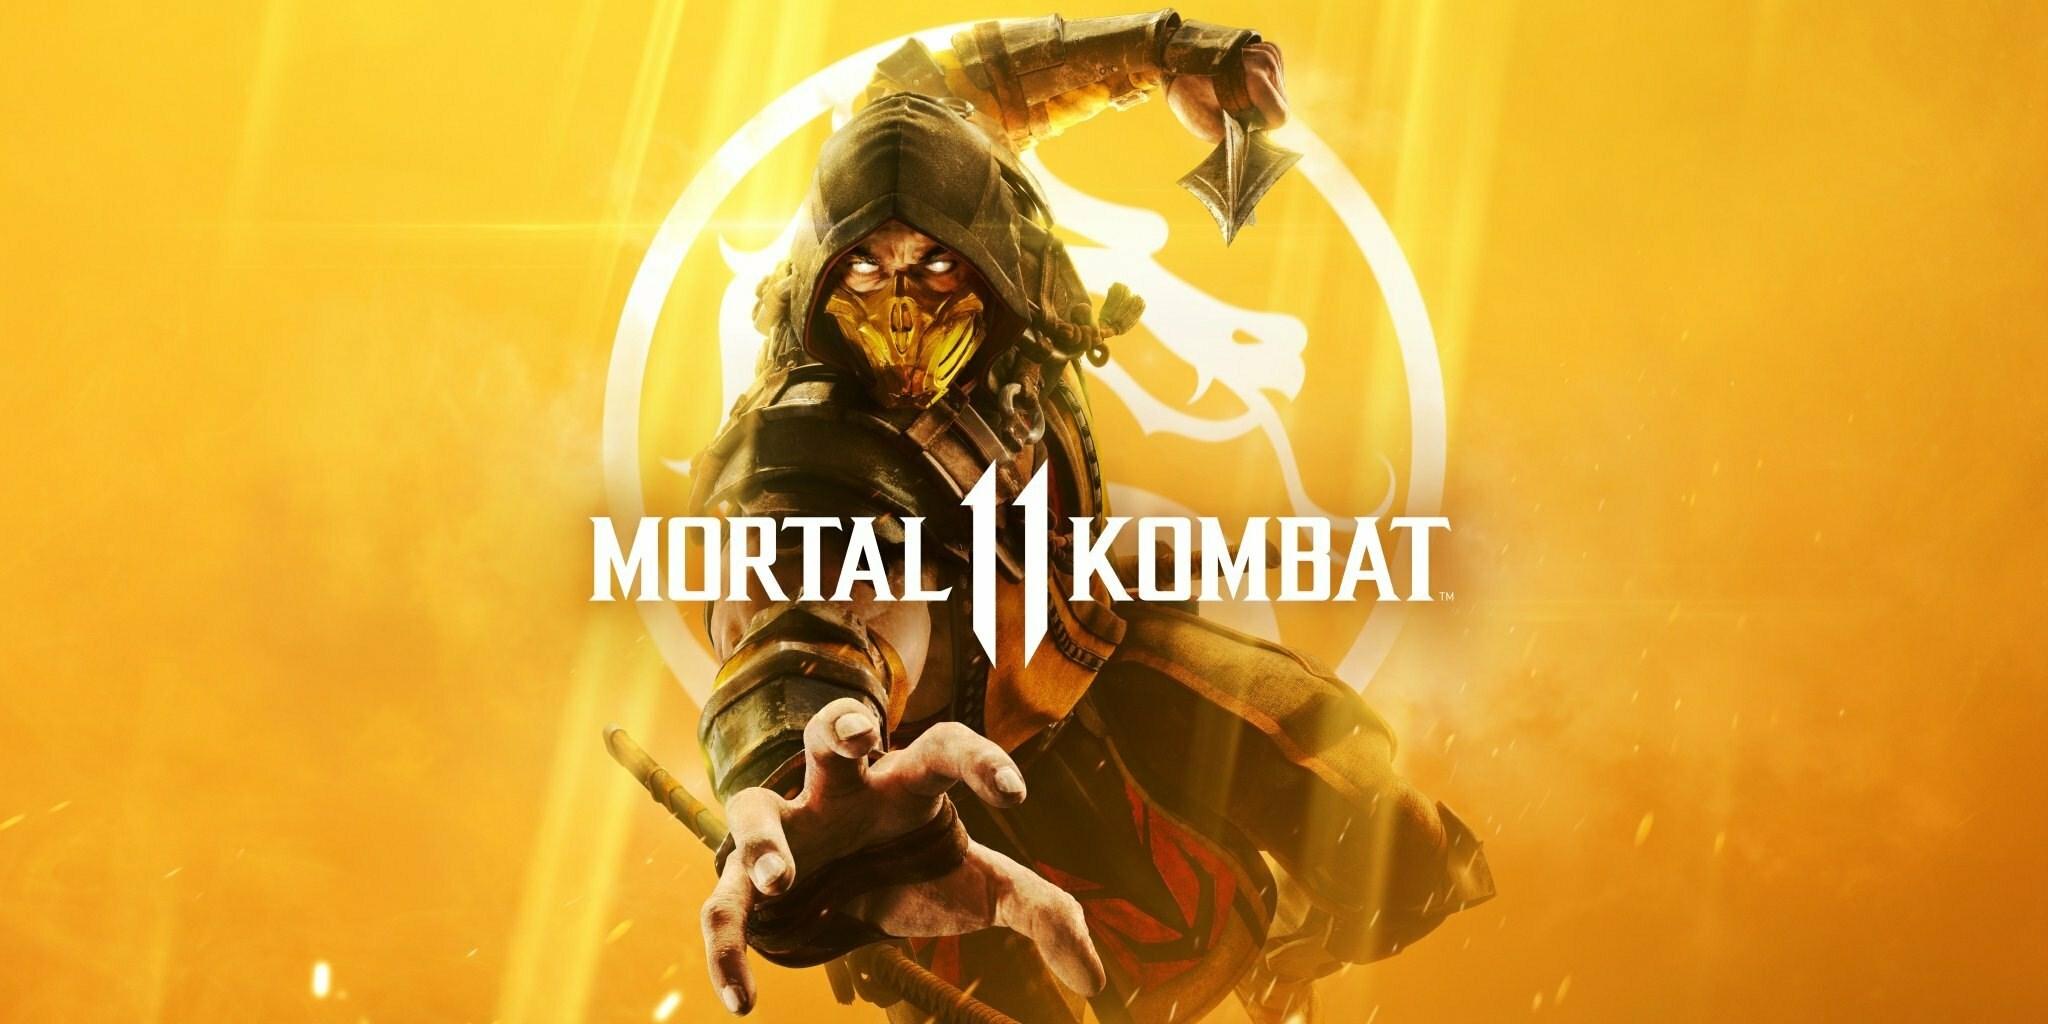 Mortal Kombat 11: Los personajes descargables se anunciarán la próxima semana